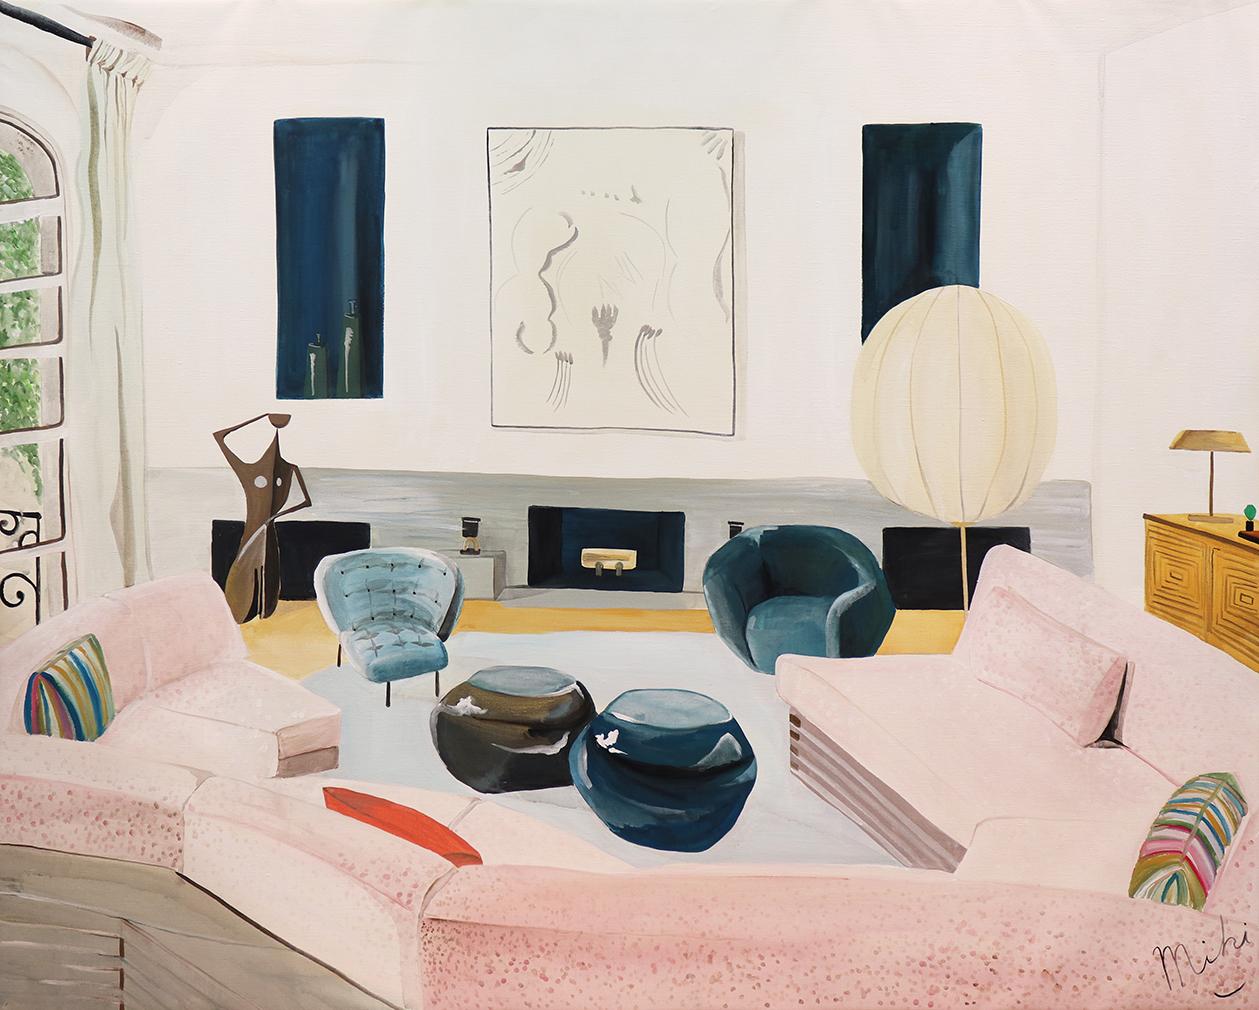 Miki Matsuyama, 'NYC Apartment Designed by Sandra Weingport', 2020